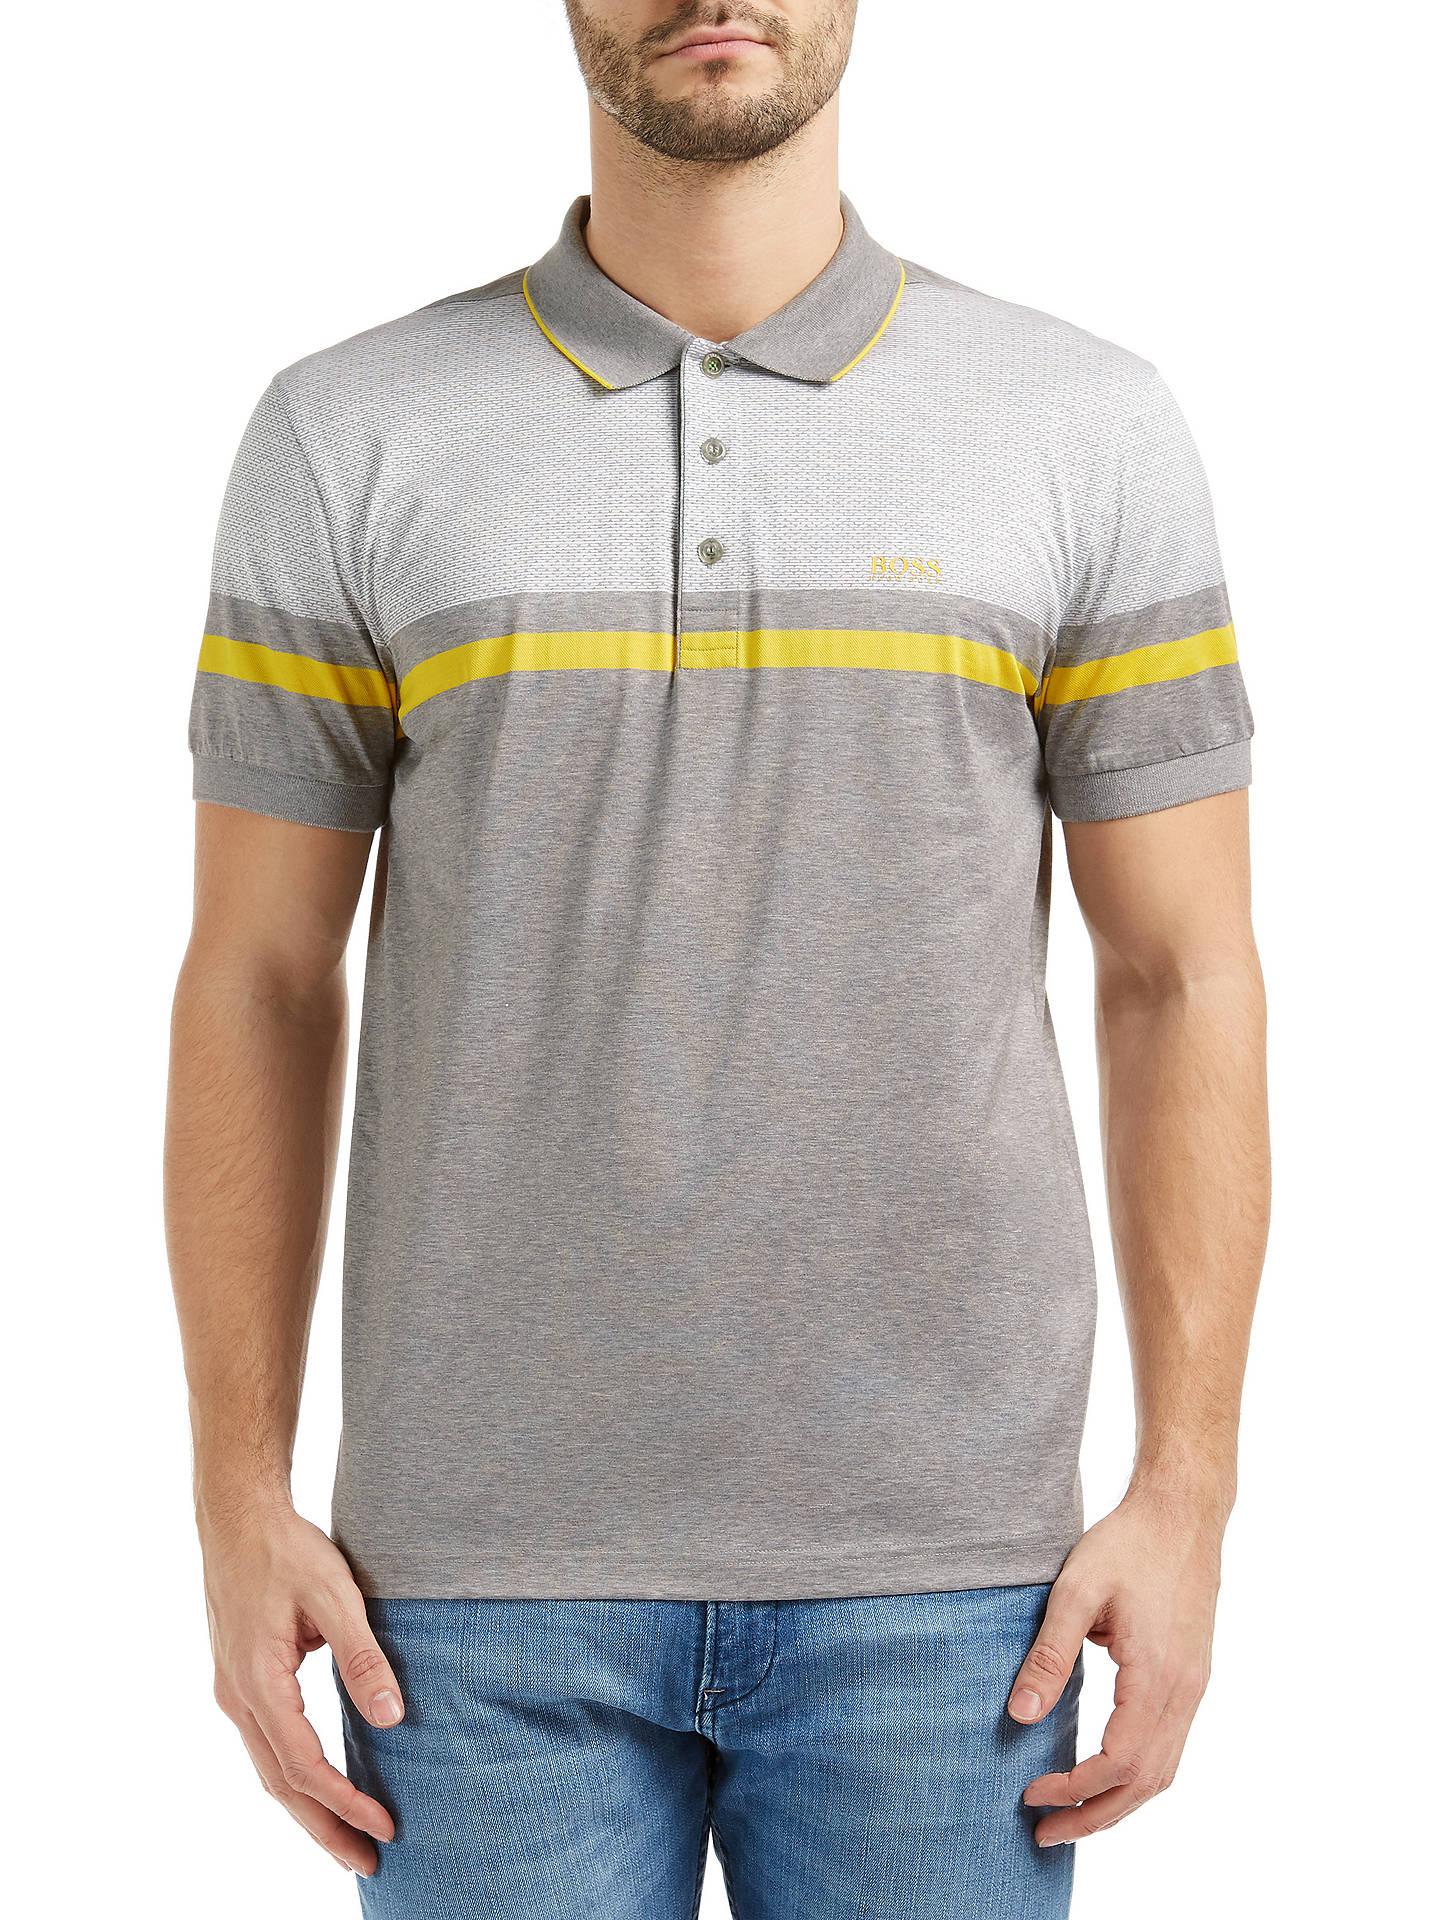 bcd1103d Buy BOSS Green Paule 5 Mercerised Cotton Polo Shirt, Light Pastel Grey, S  Online ...